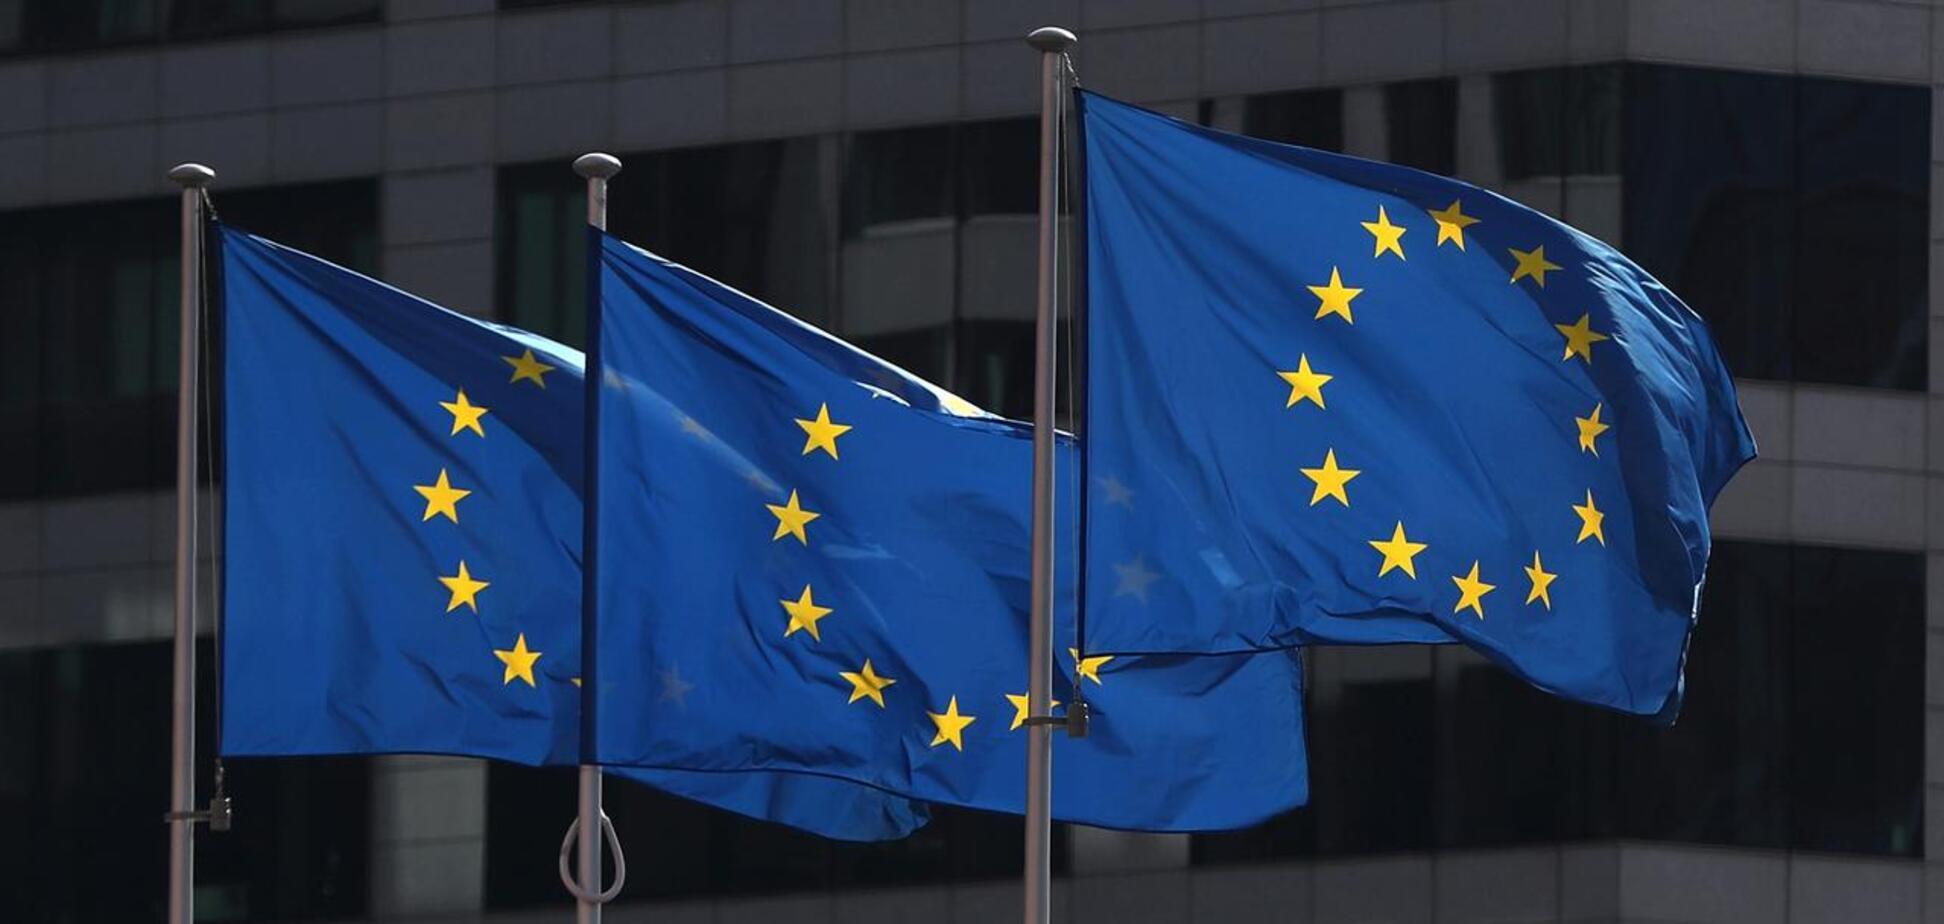 В Европе озвучили план перехода на 'зеленую' экономику